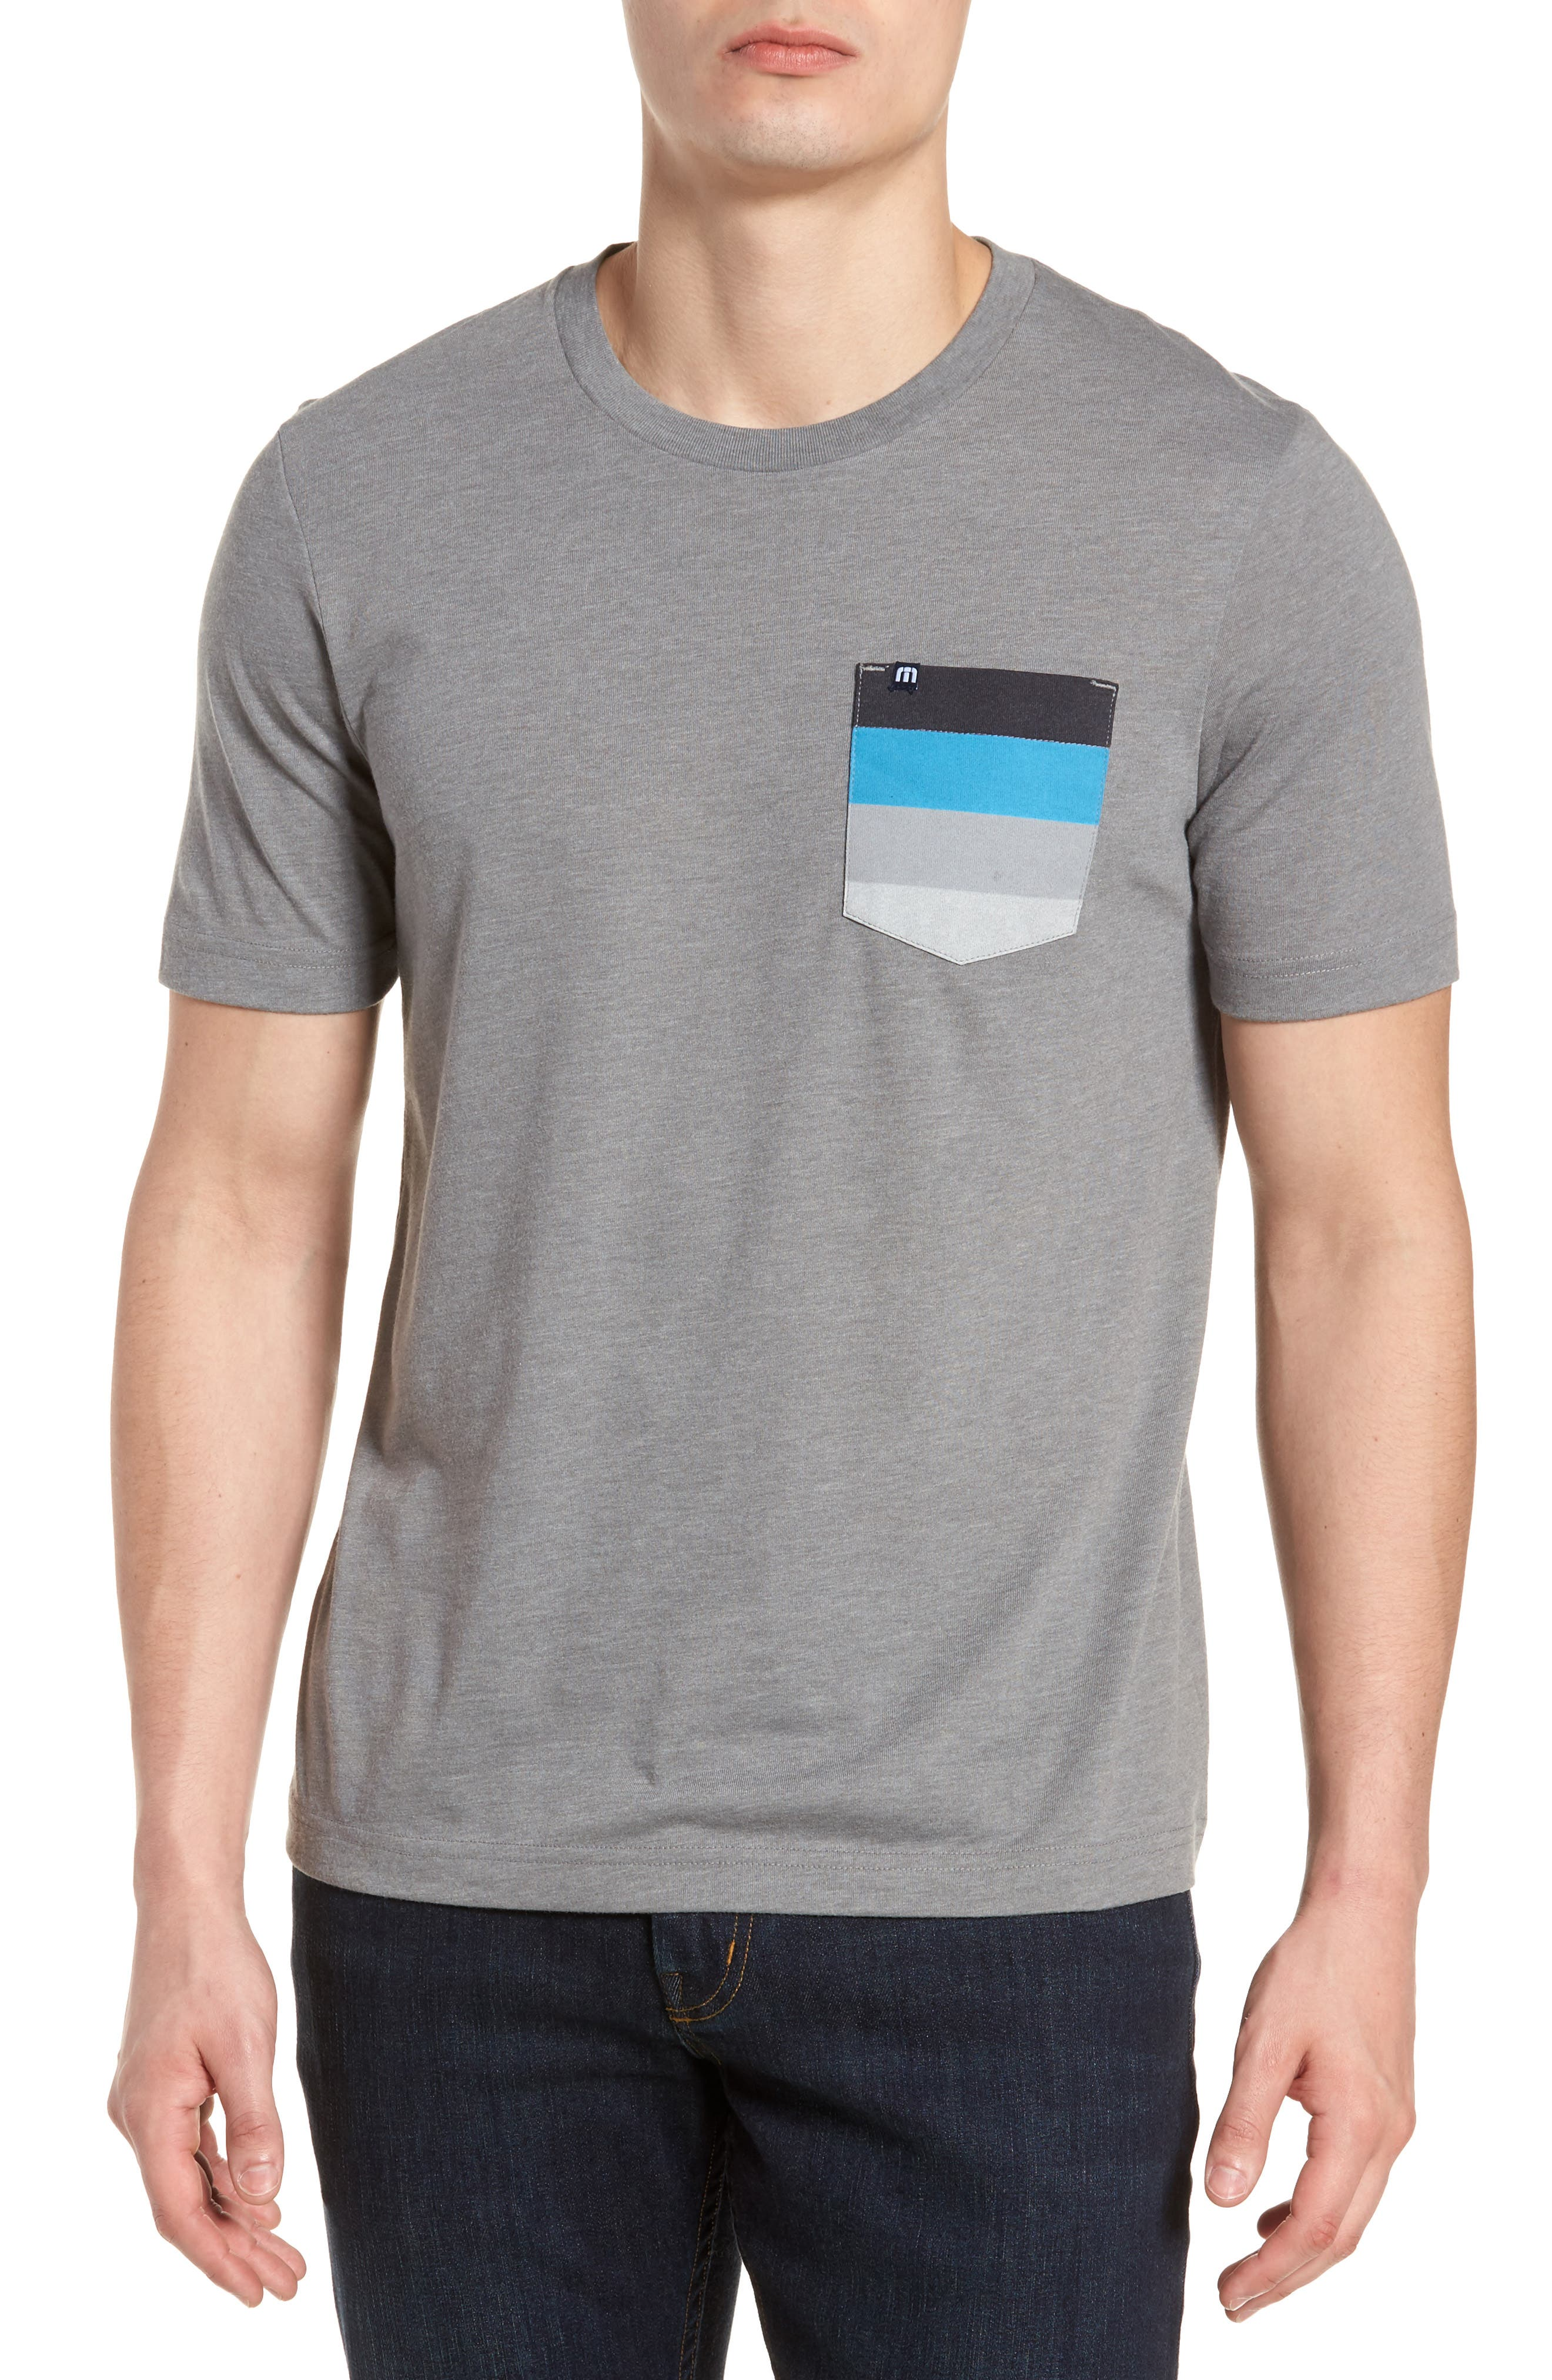 Chappy Doo Pocket T-Shirt,                             Main thumbnail 1, color,                             Heather Grey